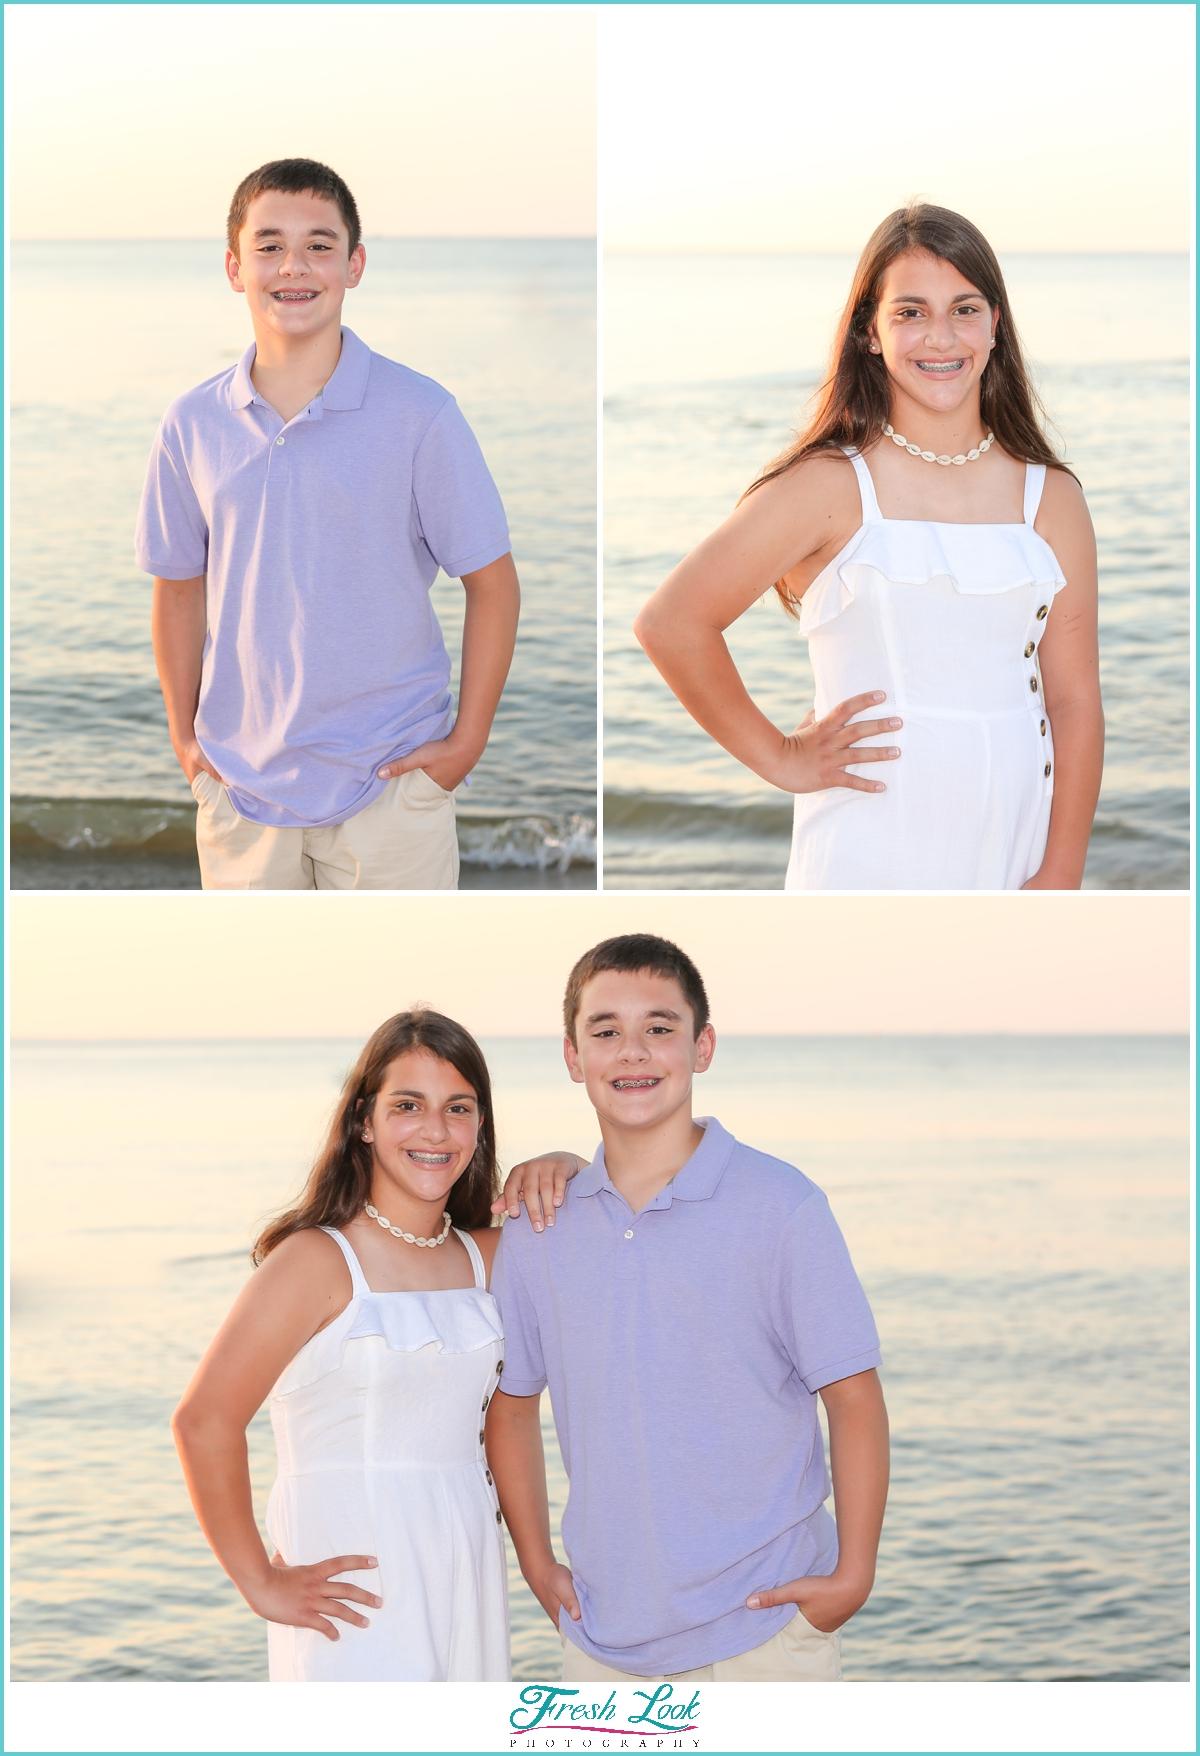 sibling photos in Virginia Beach